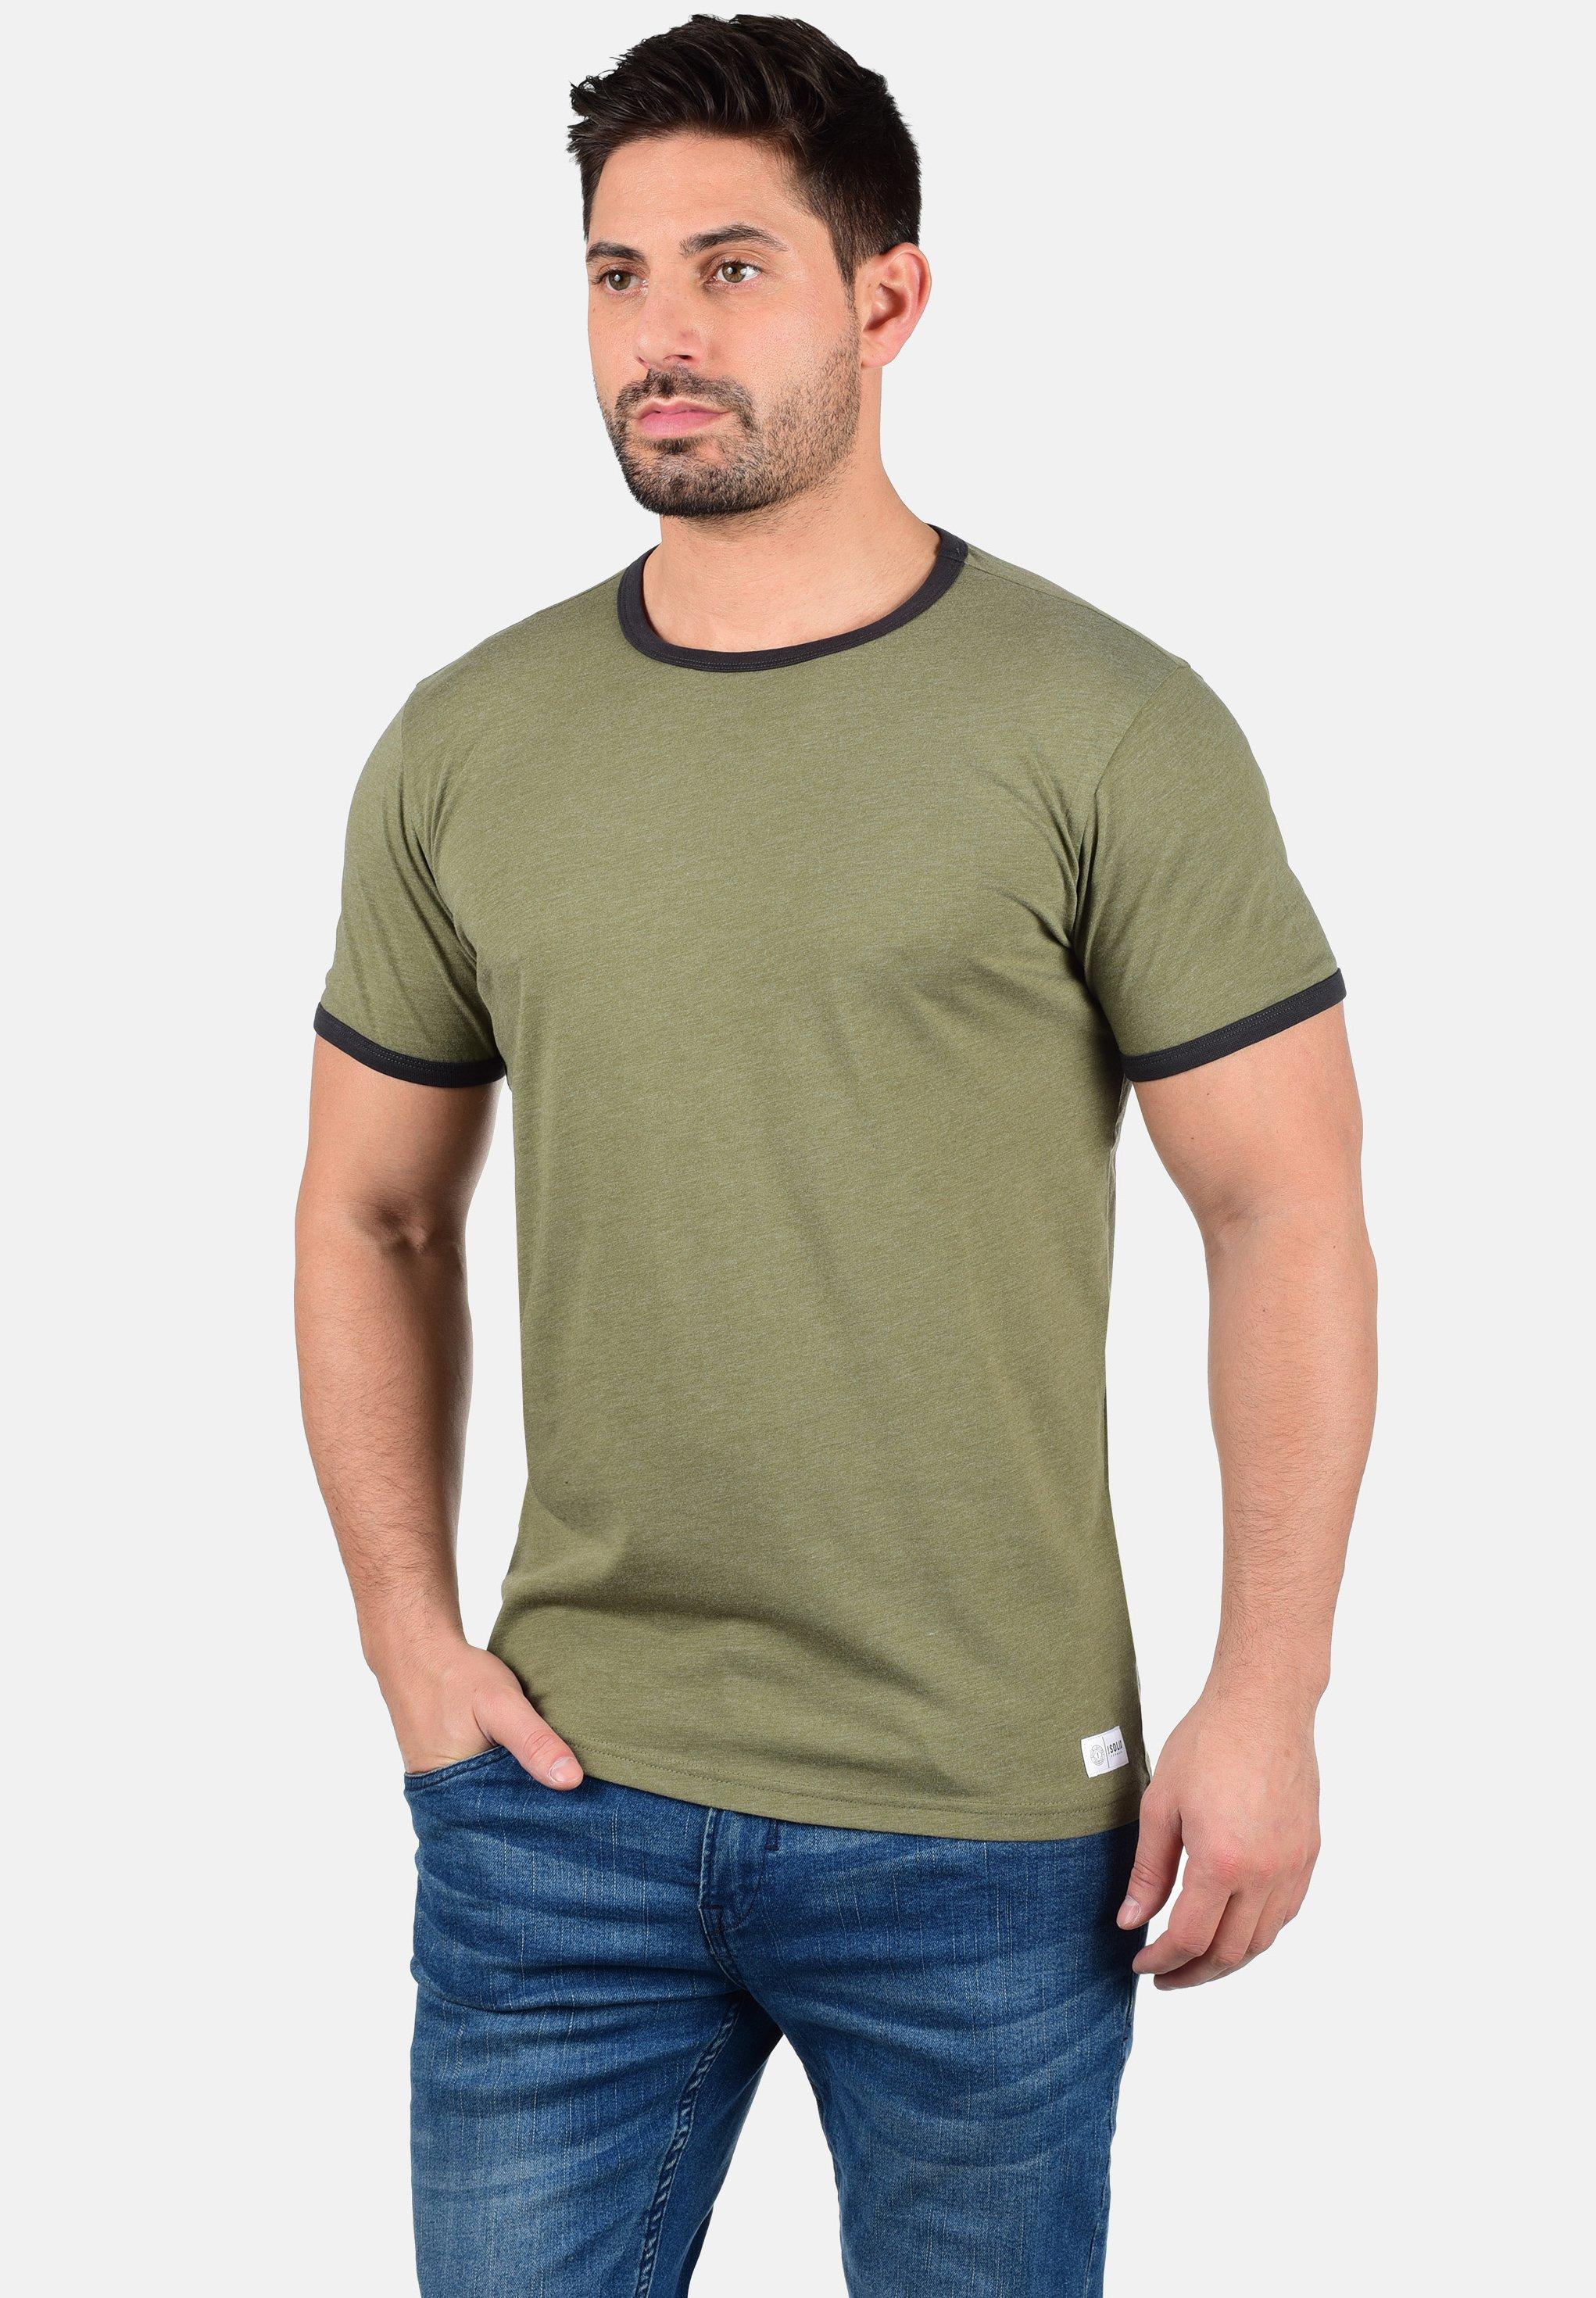 Uomo MANOLDO - T-shirt con stampa